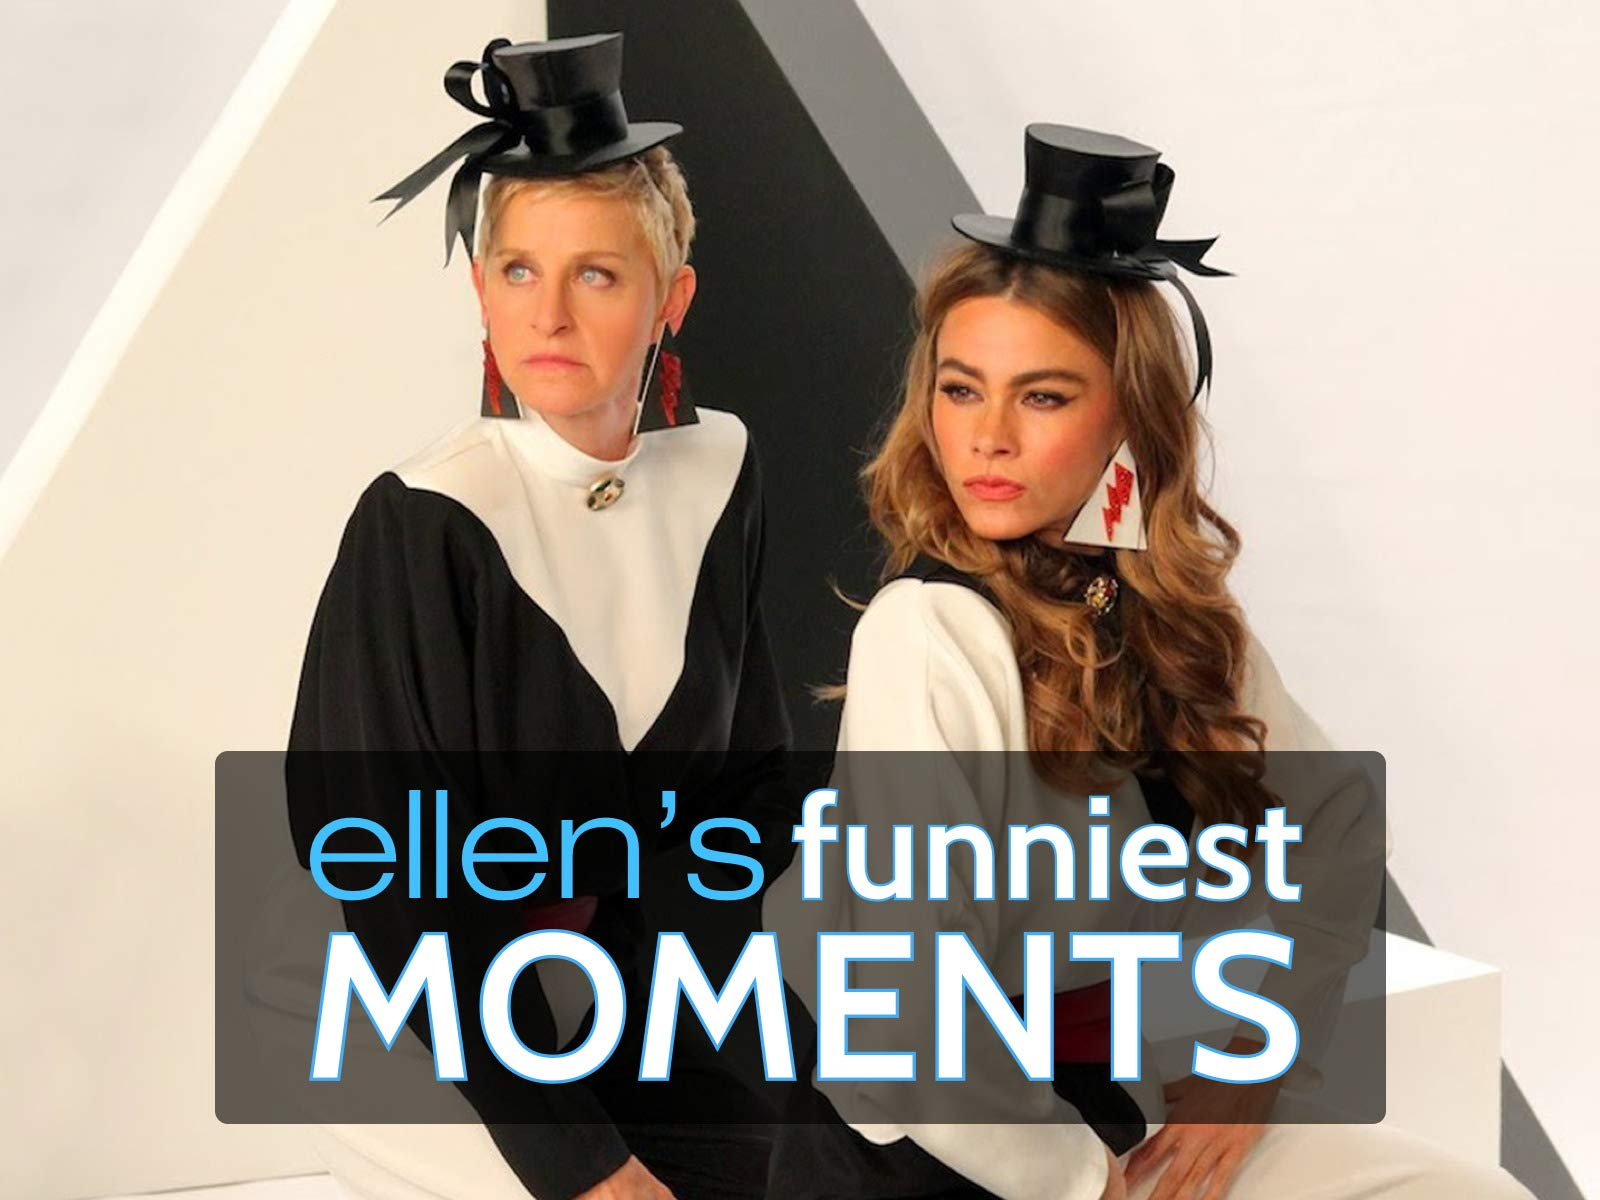 Clip: Ellen's Funniest Moments